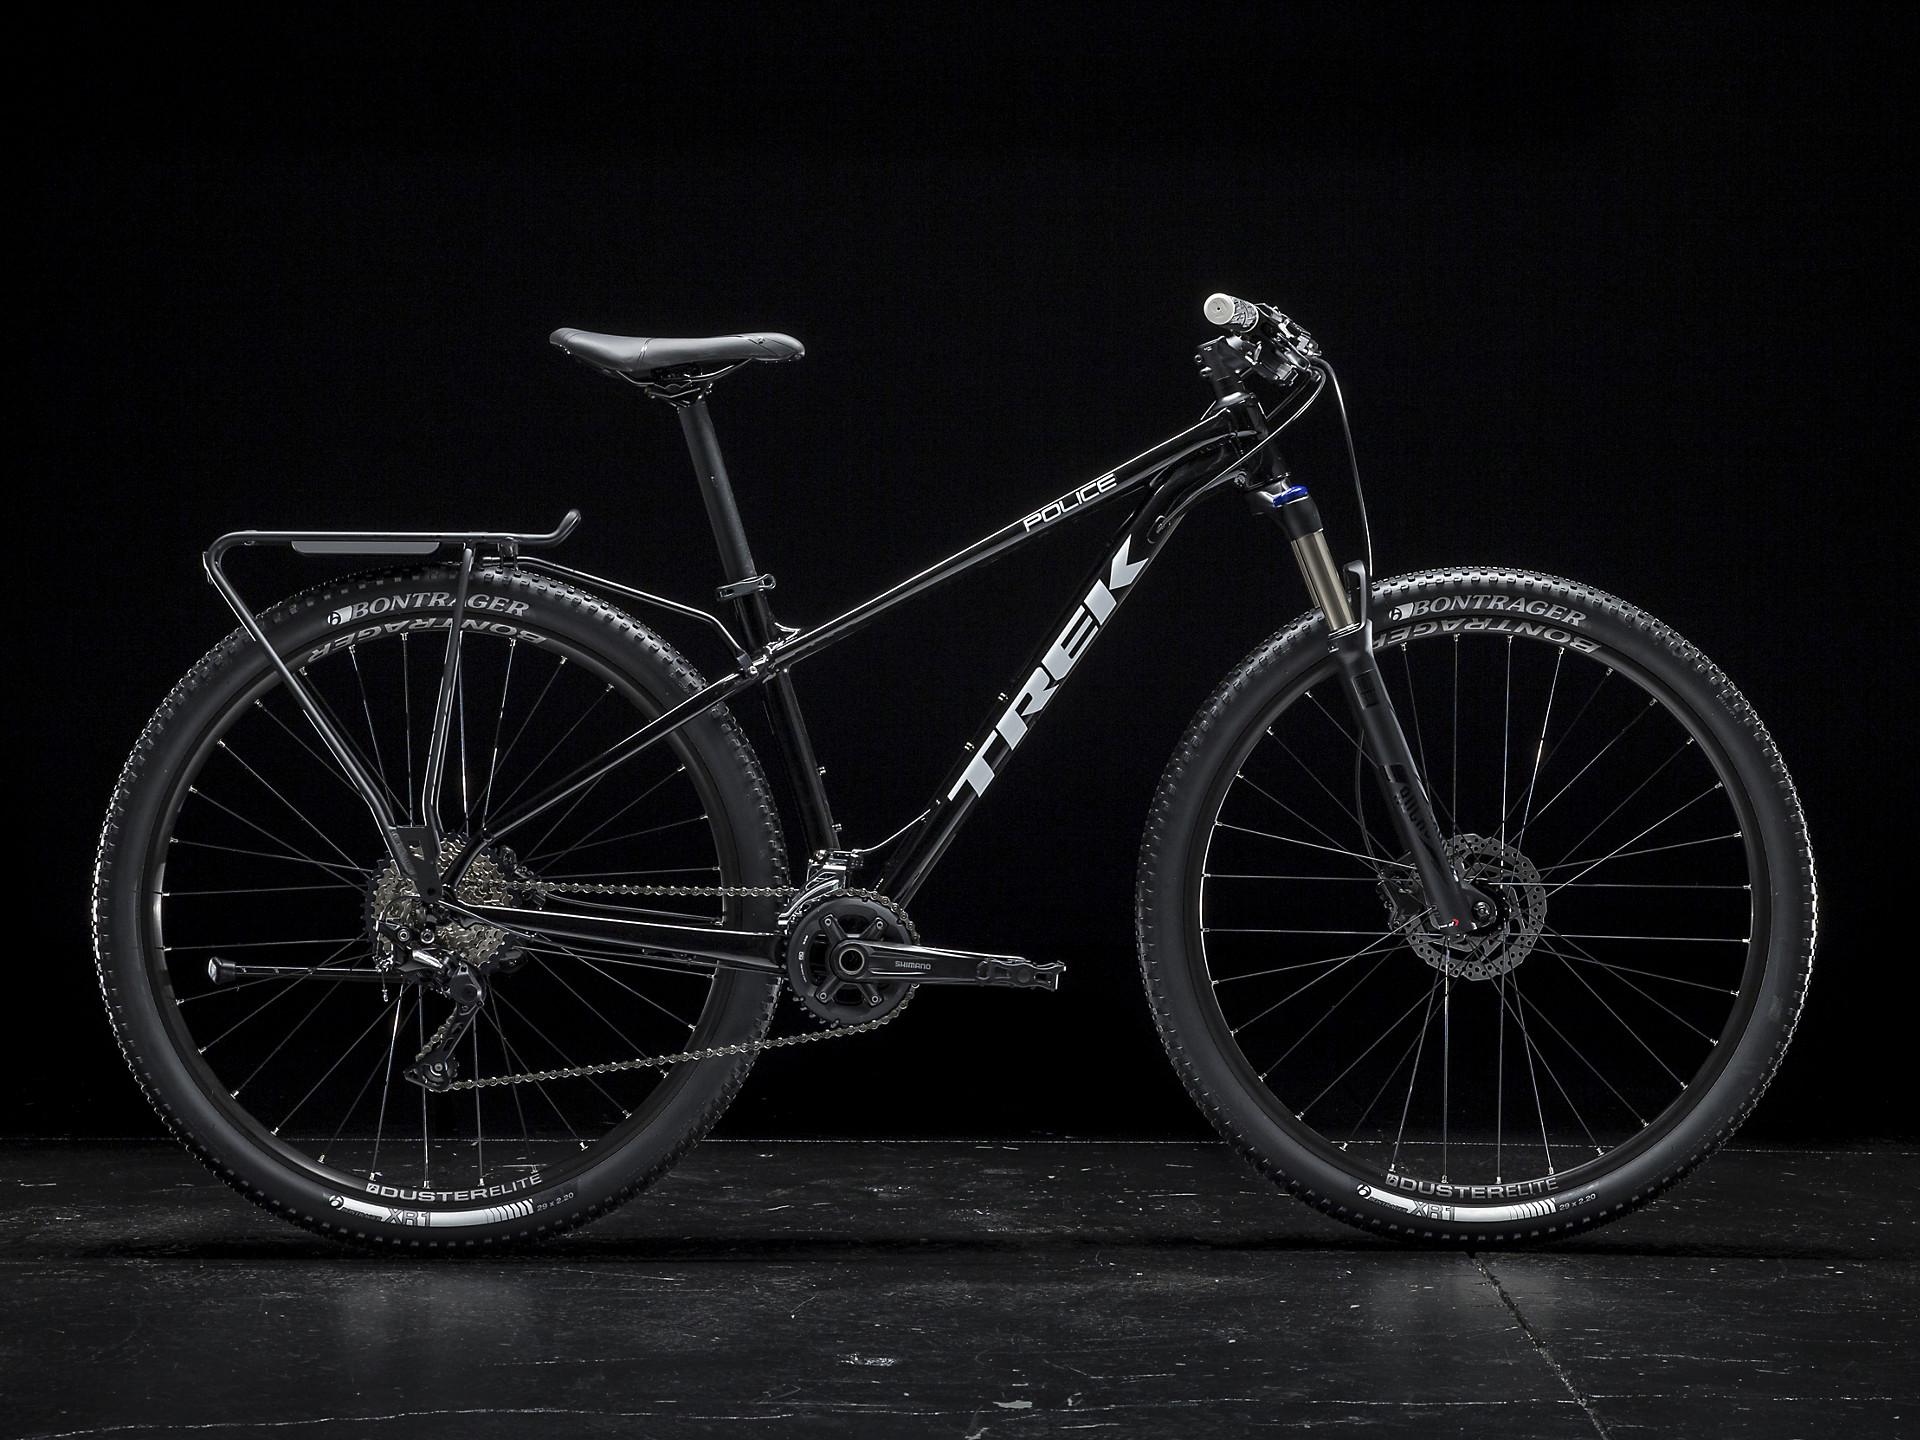 d0c27c9edda Police | Trek Bikes